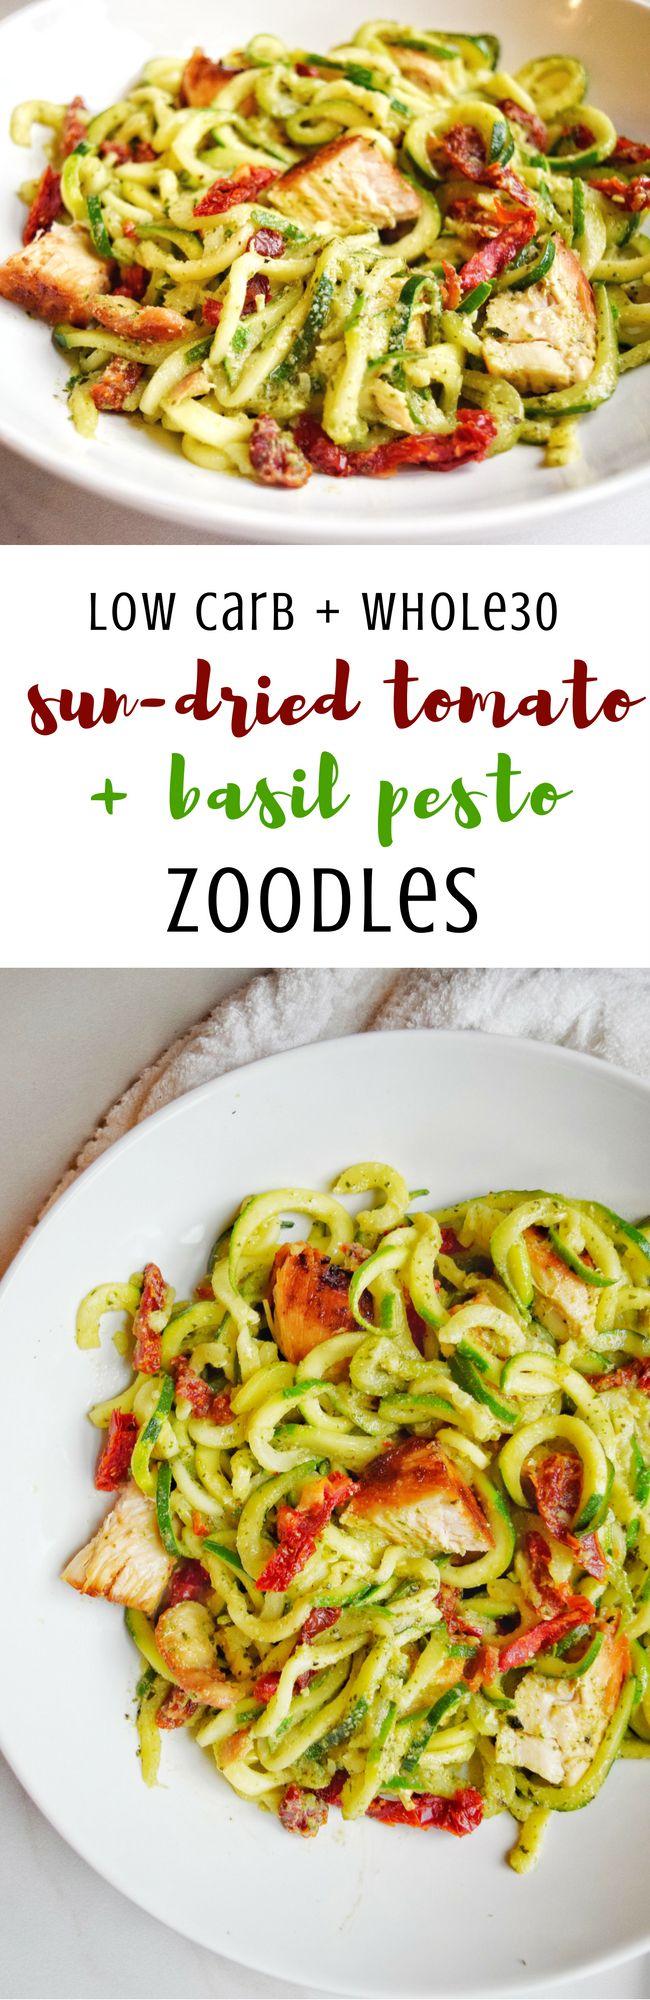 Sun-Dried Tomato & Basil Pesto Zoodles (Whole30, Dairy Free, Paleo) | Personally Paleo  #whole30 #paleo #dairyfree #lowcarb